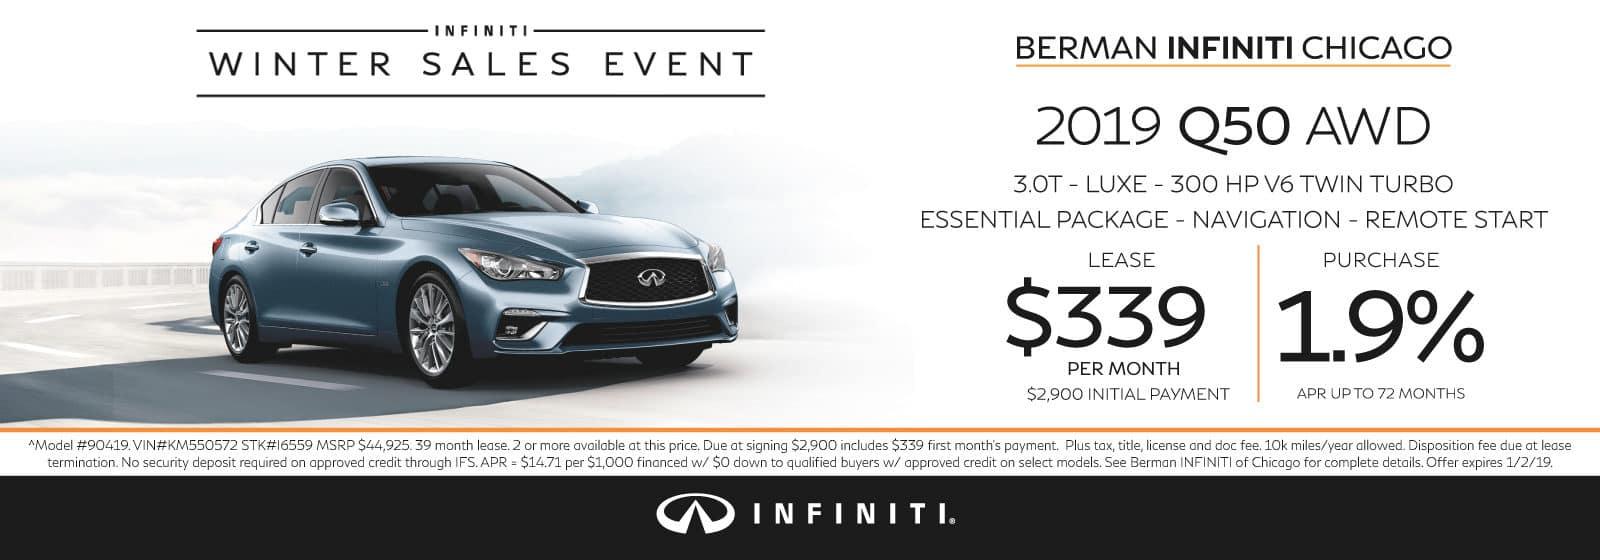 New 2019 INFINITI Q50 December offer at Berman INFINITI Chicago!